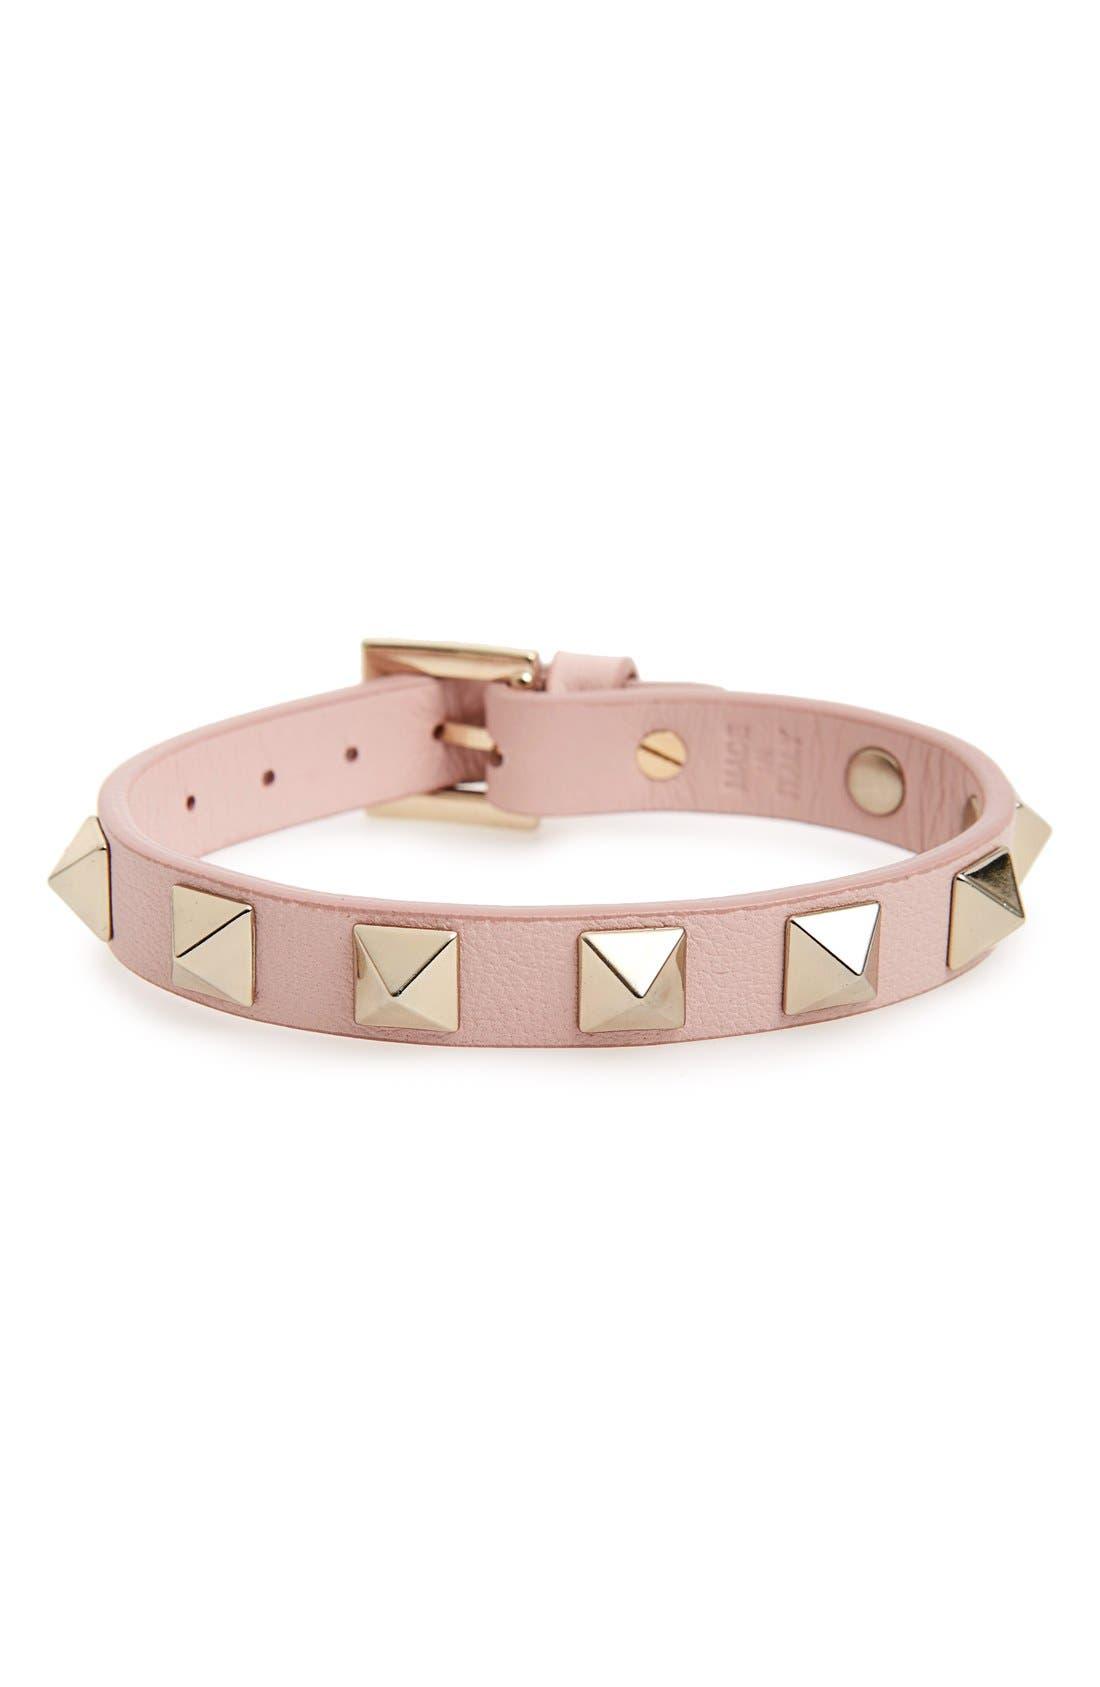 Alternate Image 1 Selected - Valentino 'Rockstud' Leather Bracelet